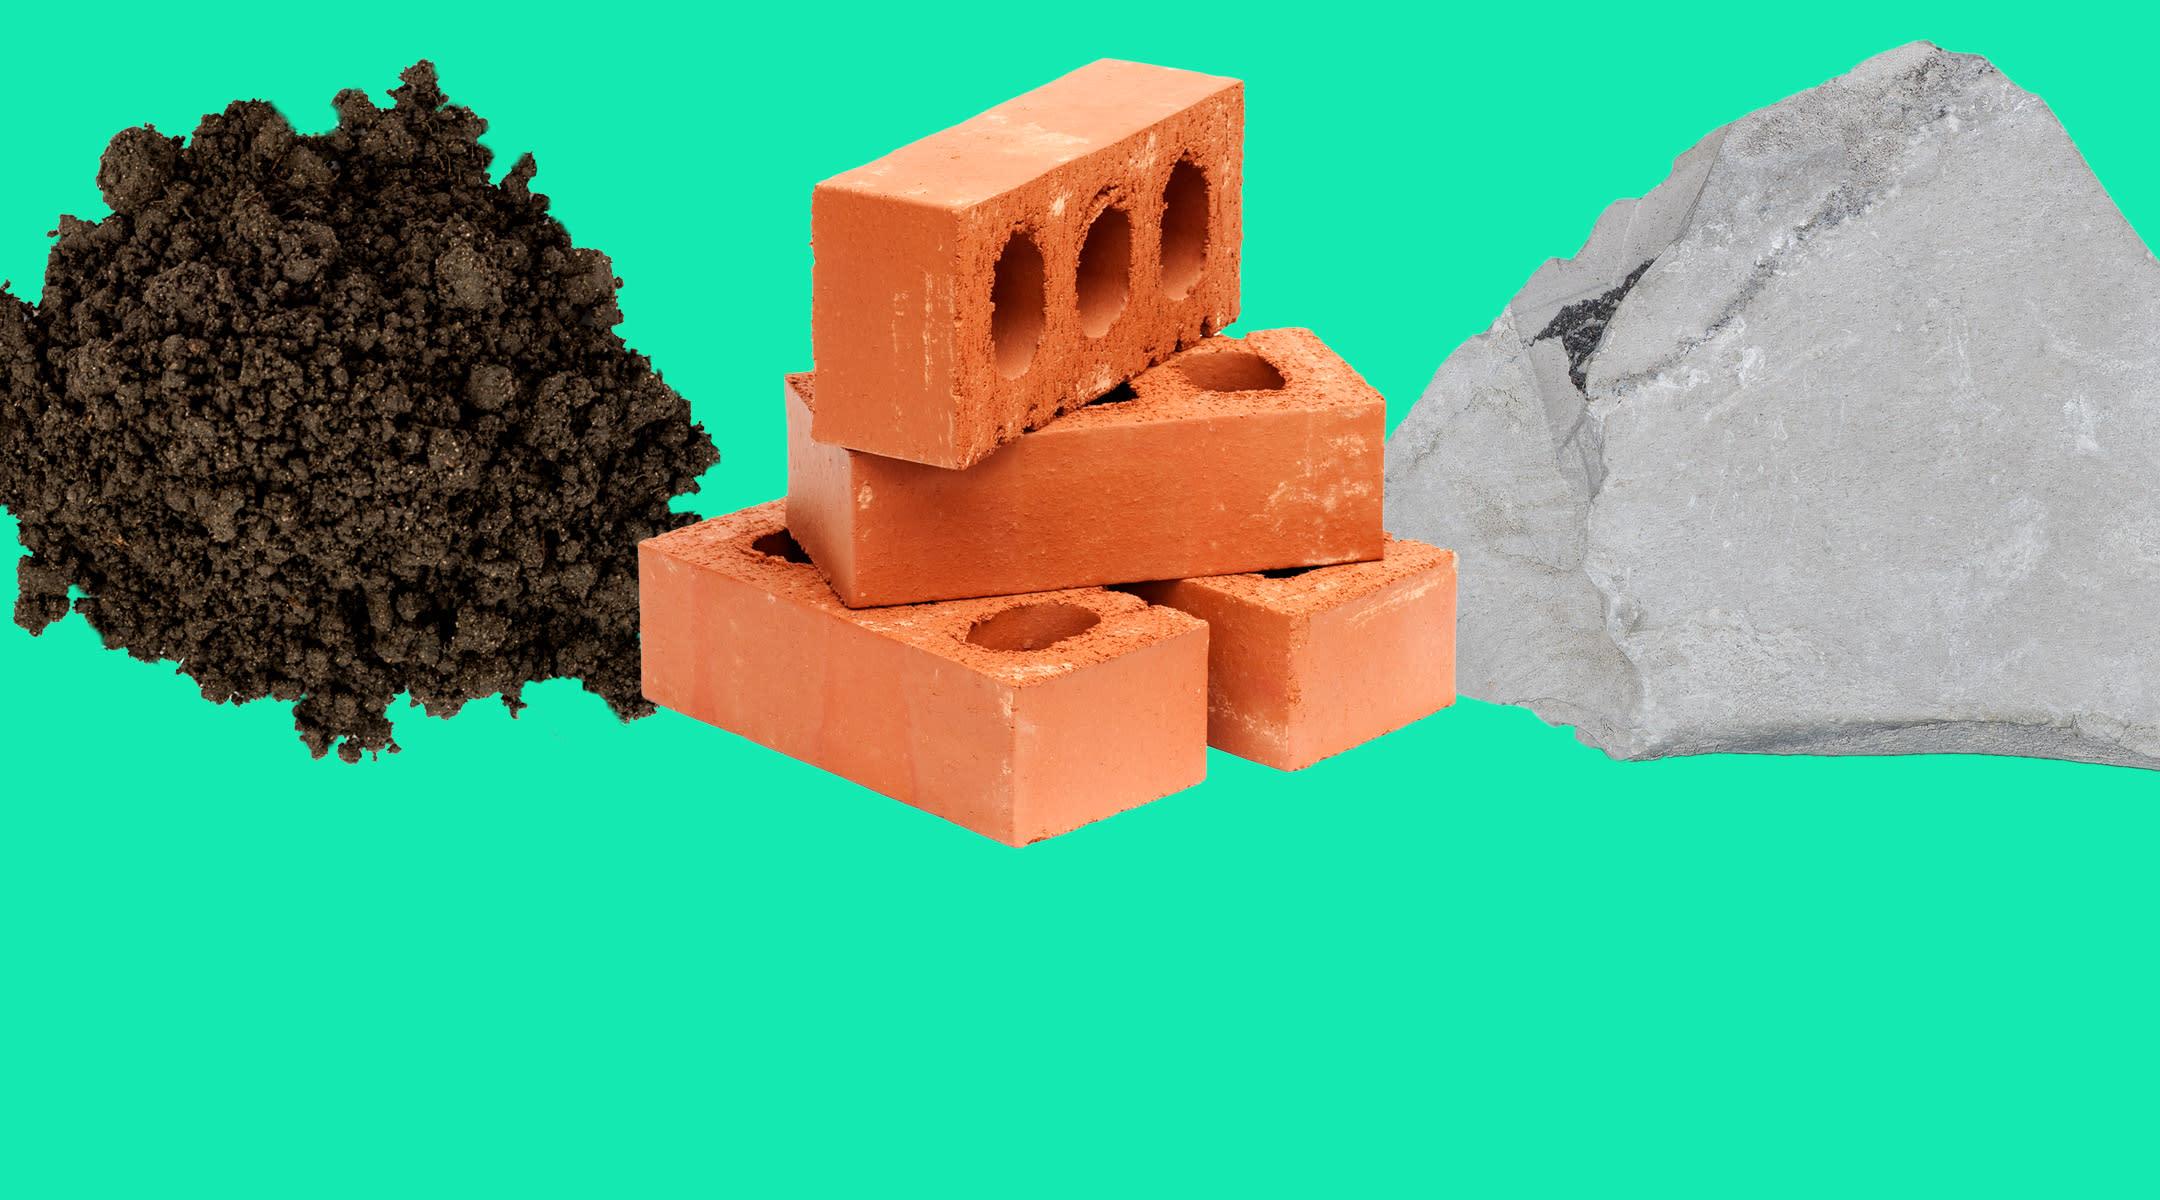 pica pregnancy craving rock dirt clay